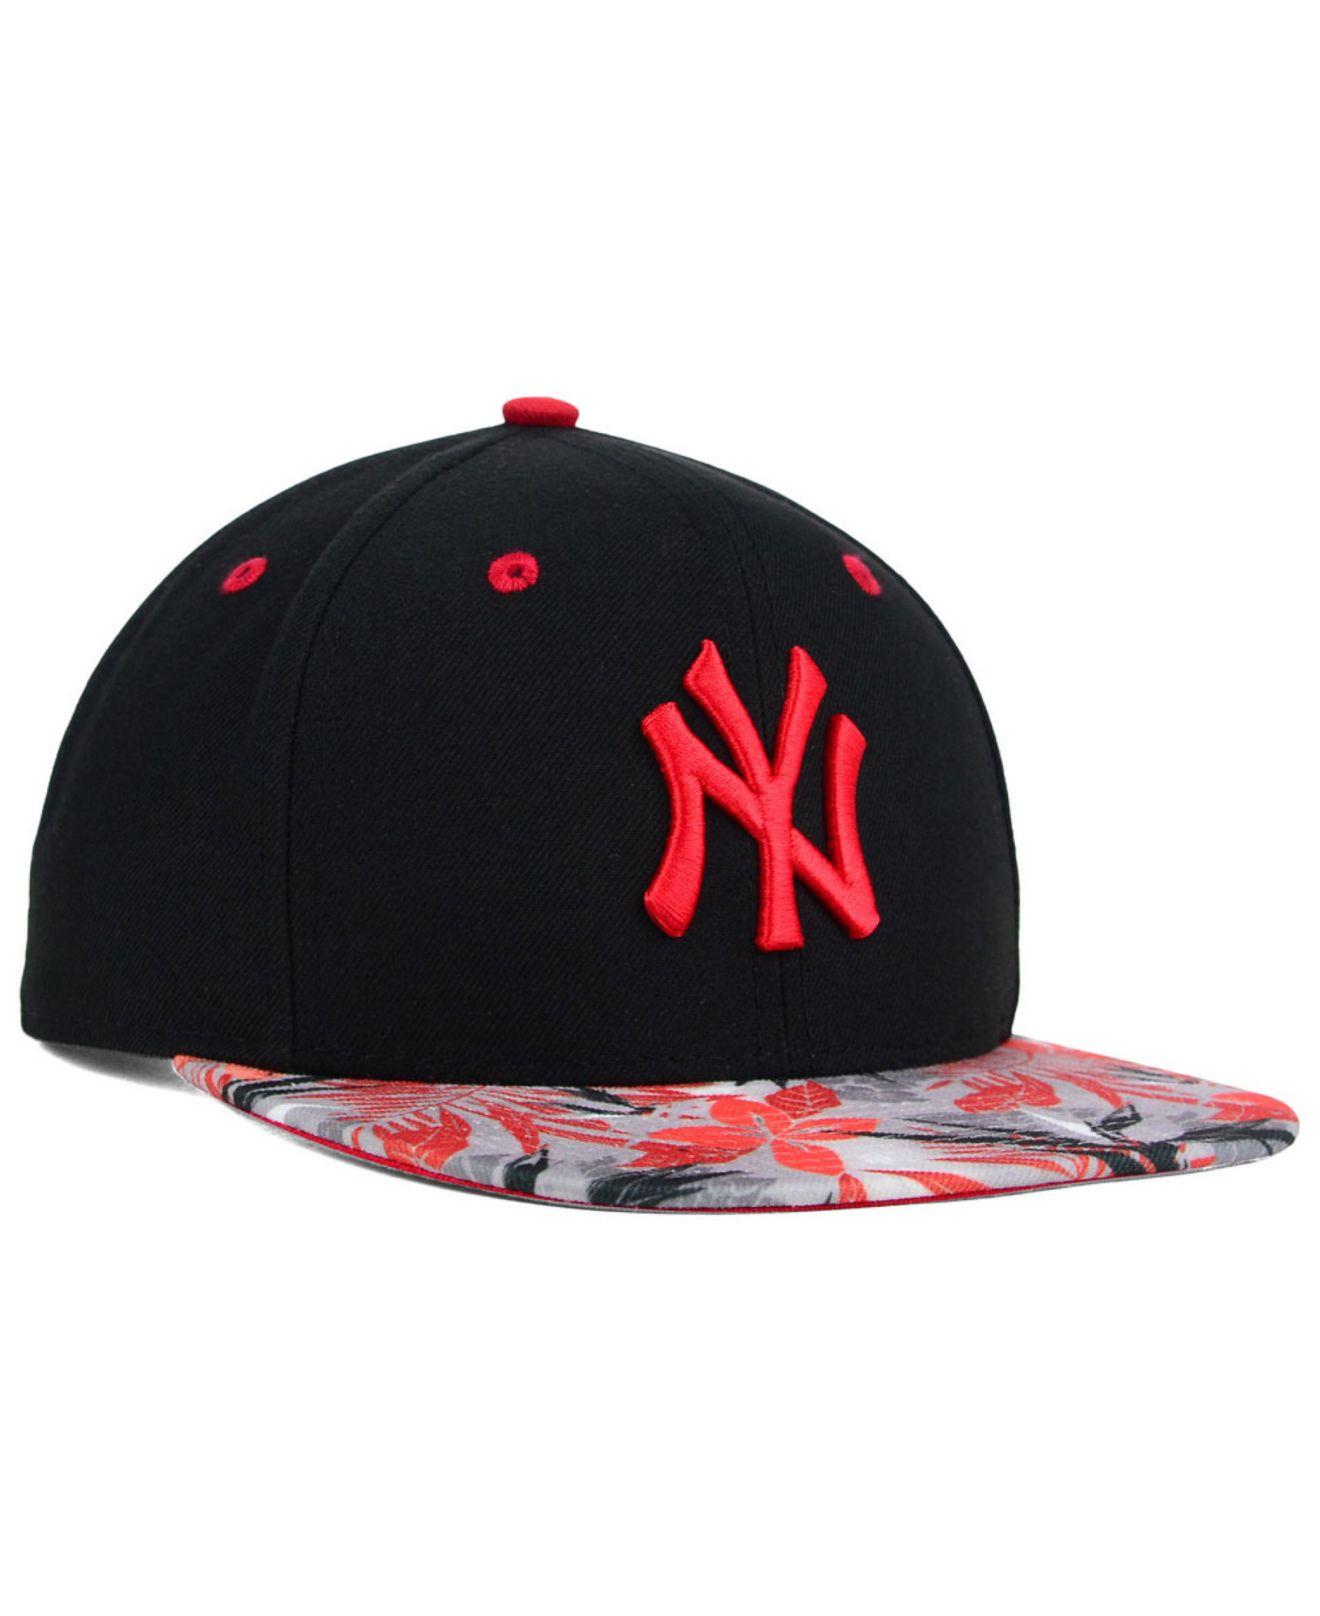 442f4ee29f0 Lyst - KTZ New York Yankees Floral Viz 9fifty Snapback Cap in Black ...